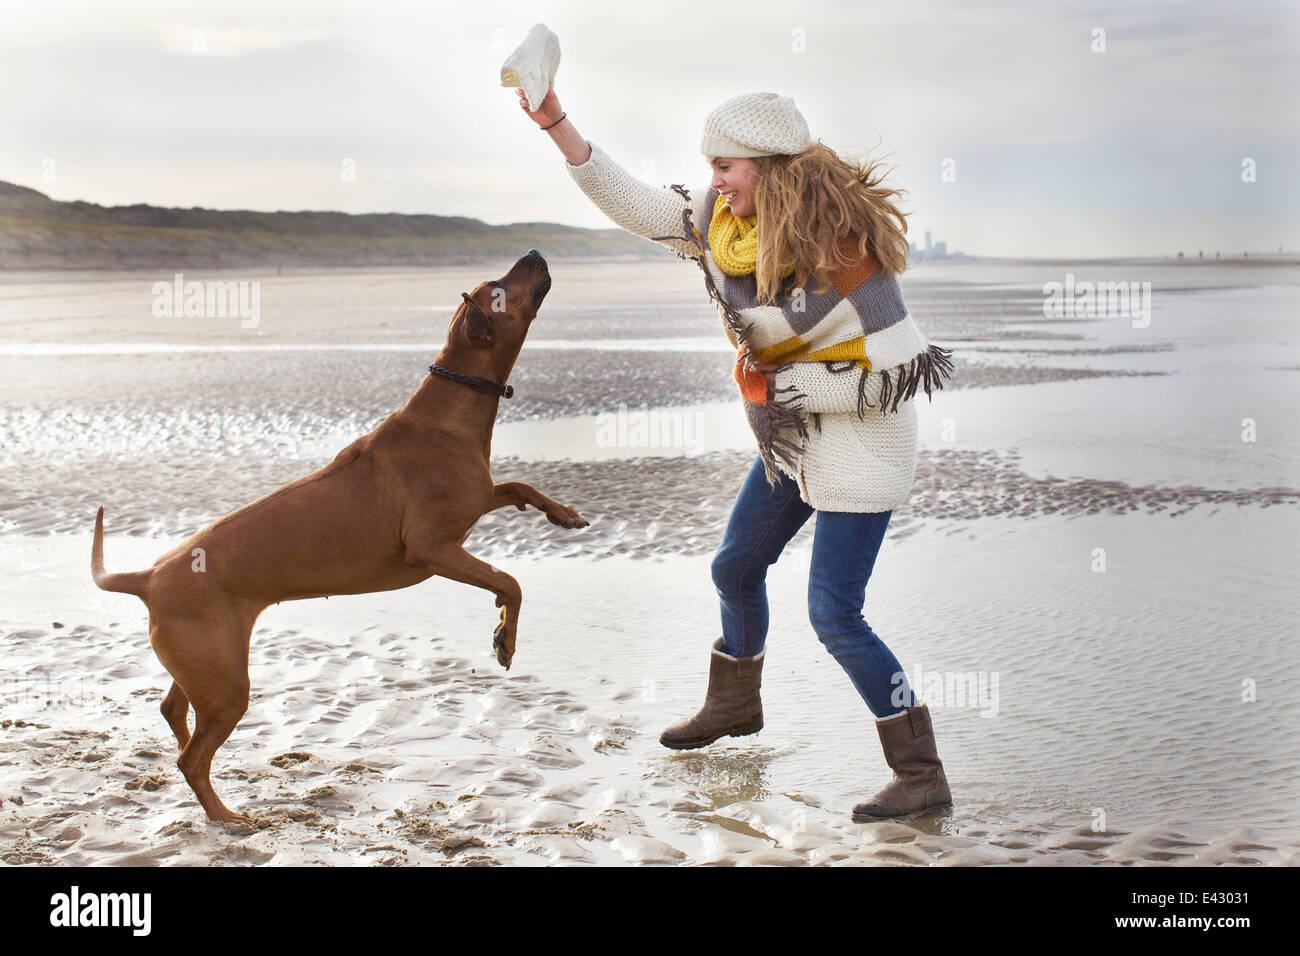 Mid adult woman teasing dog at beach, Bloemendaal aan Zee, Netherlands - Stock Image